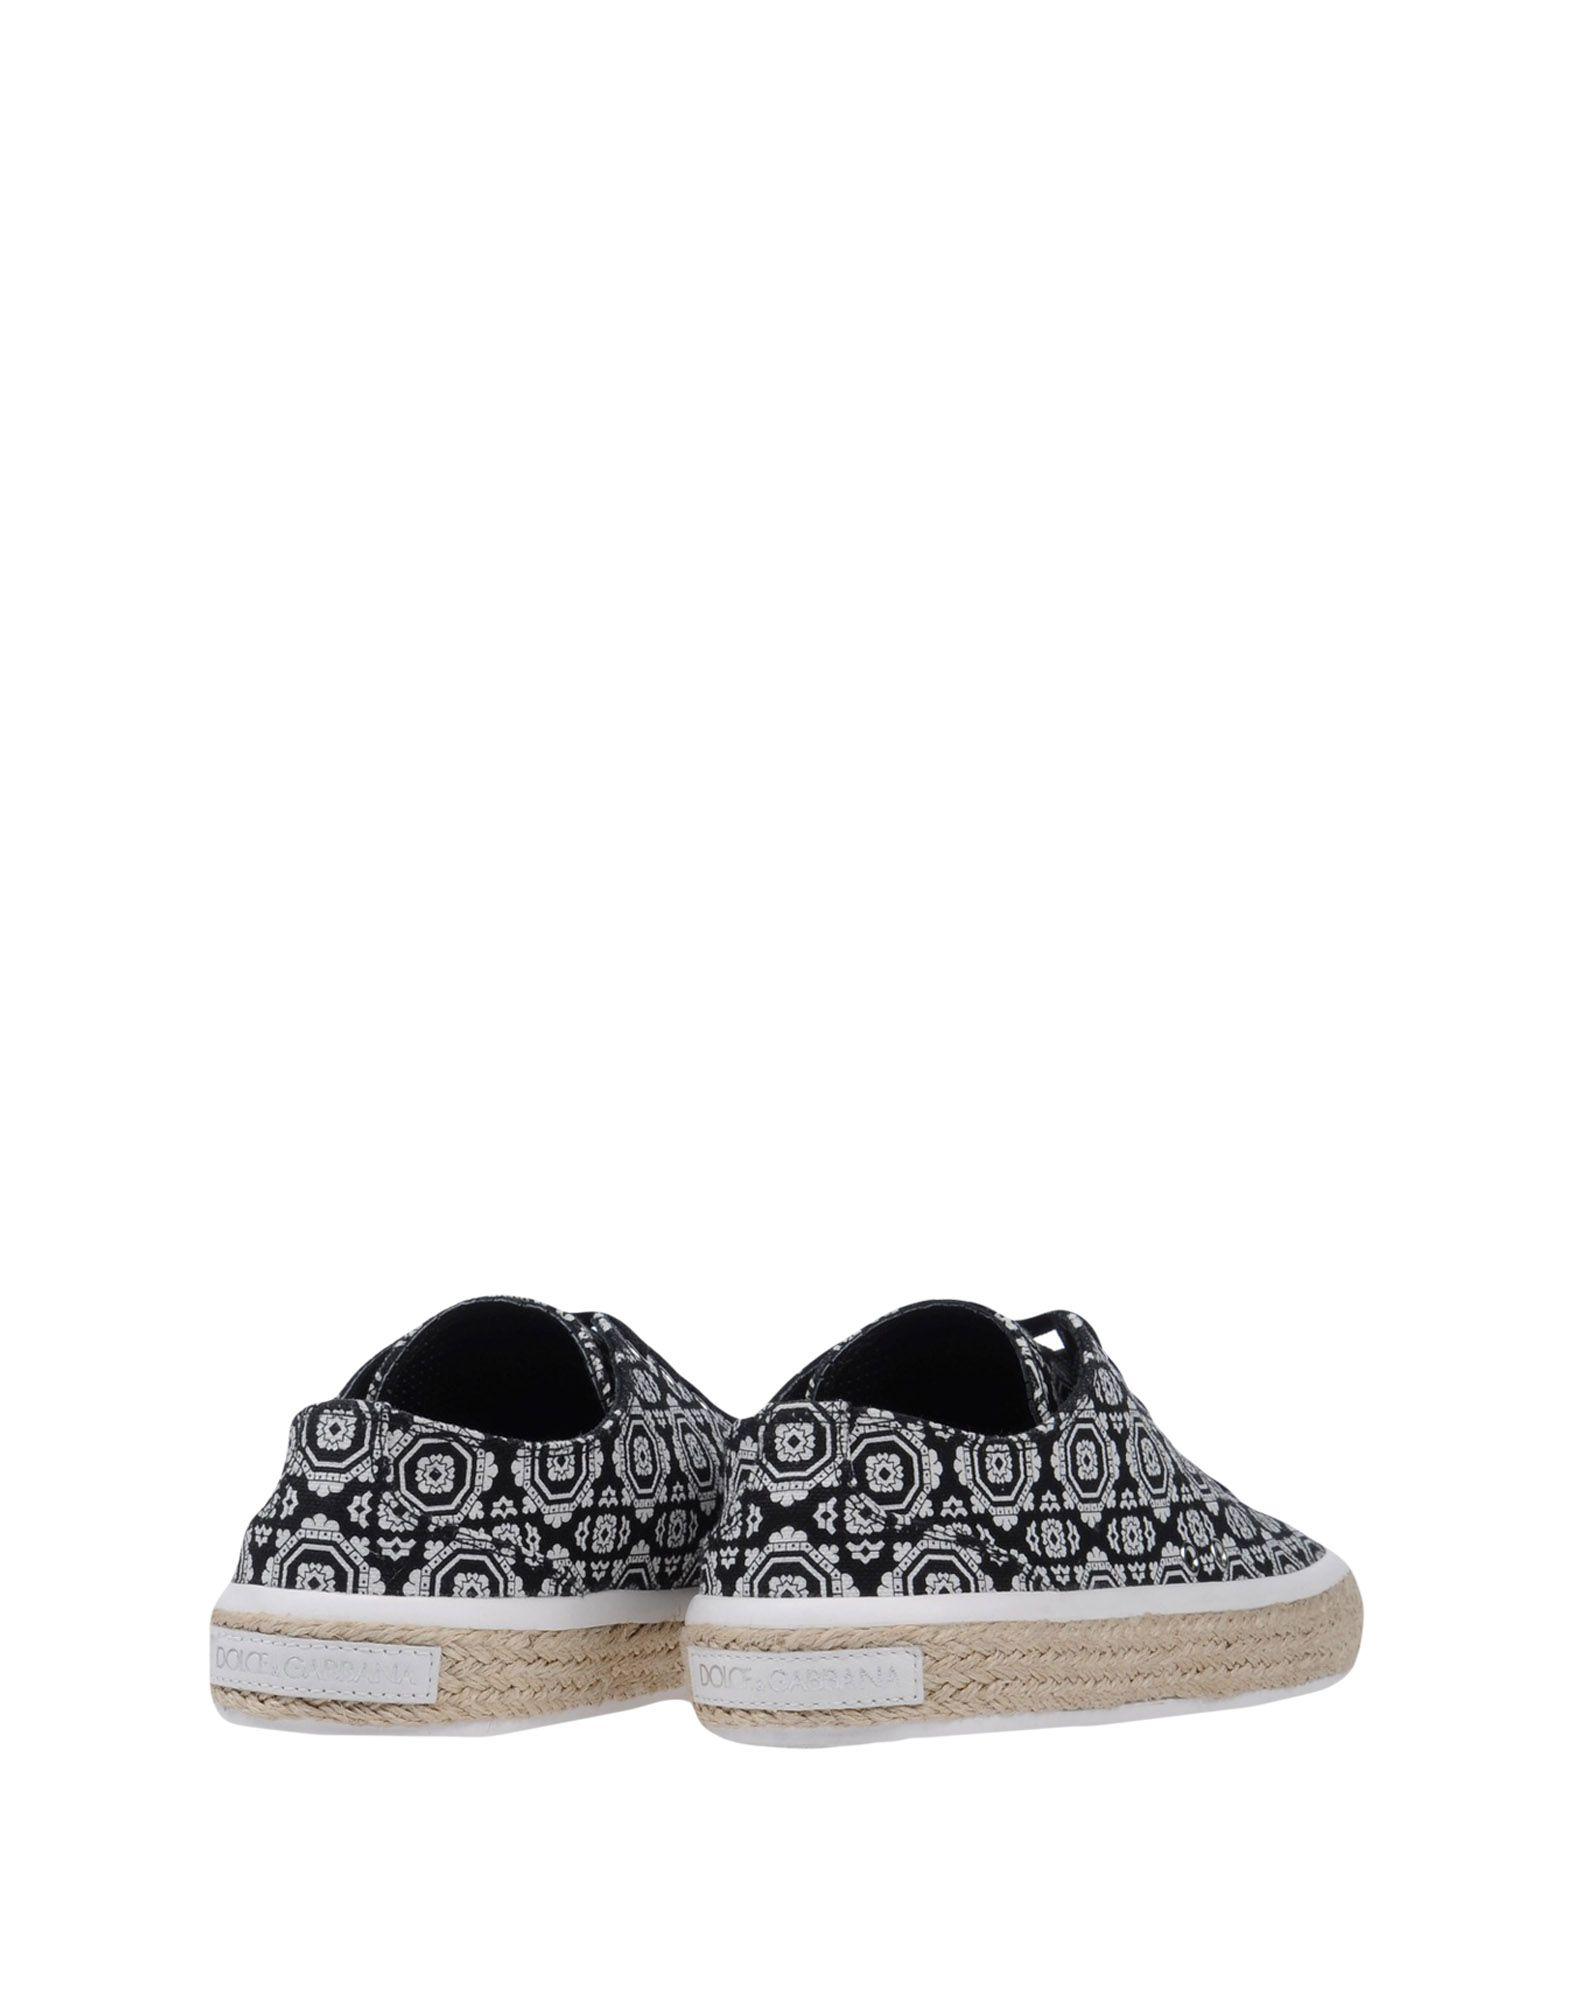 Dolce beliebte & Gabbana Sneakers Herren  11143912PF Gute Qualität beliebte Dolce Schuhe 0164b1